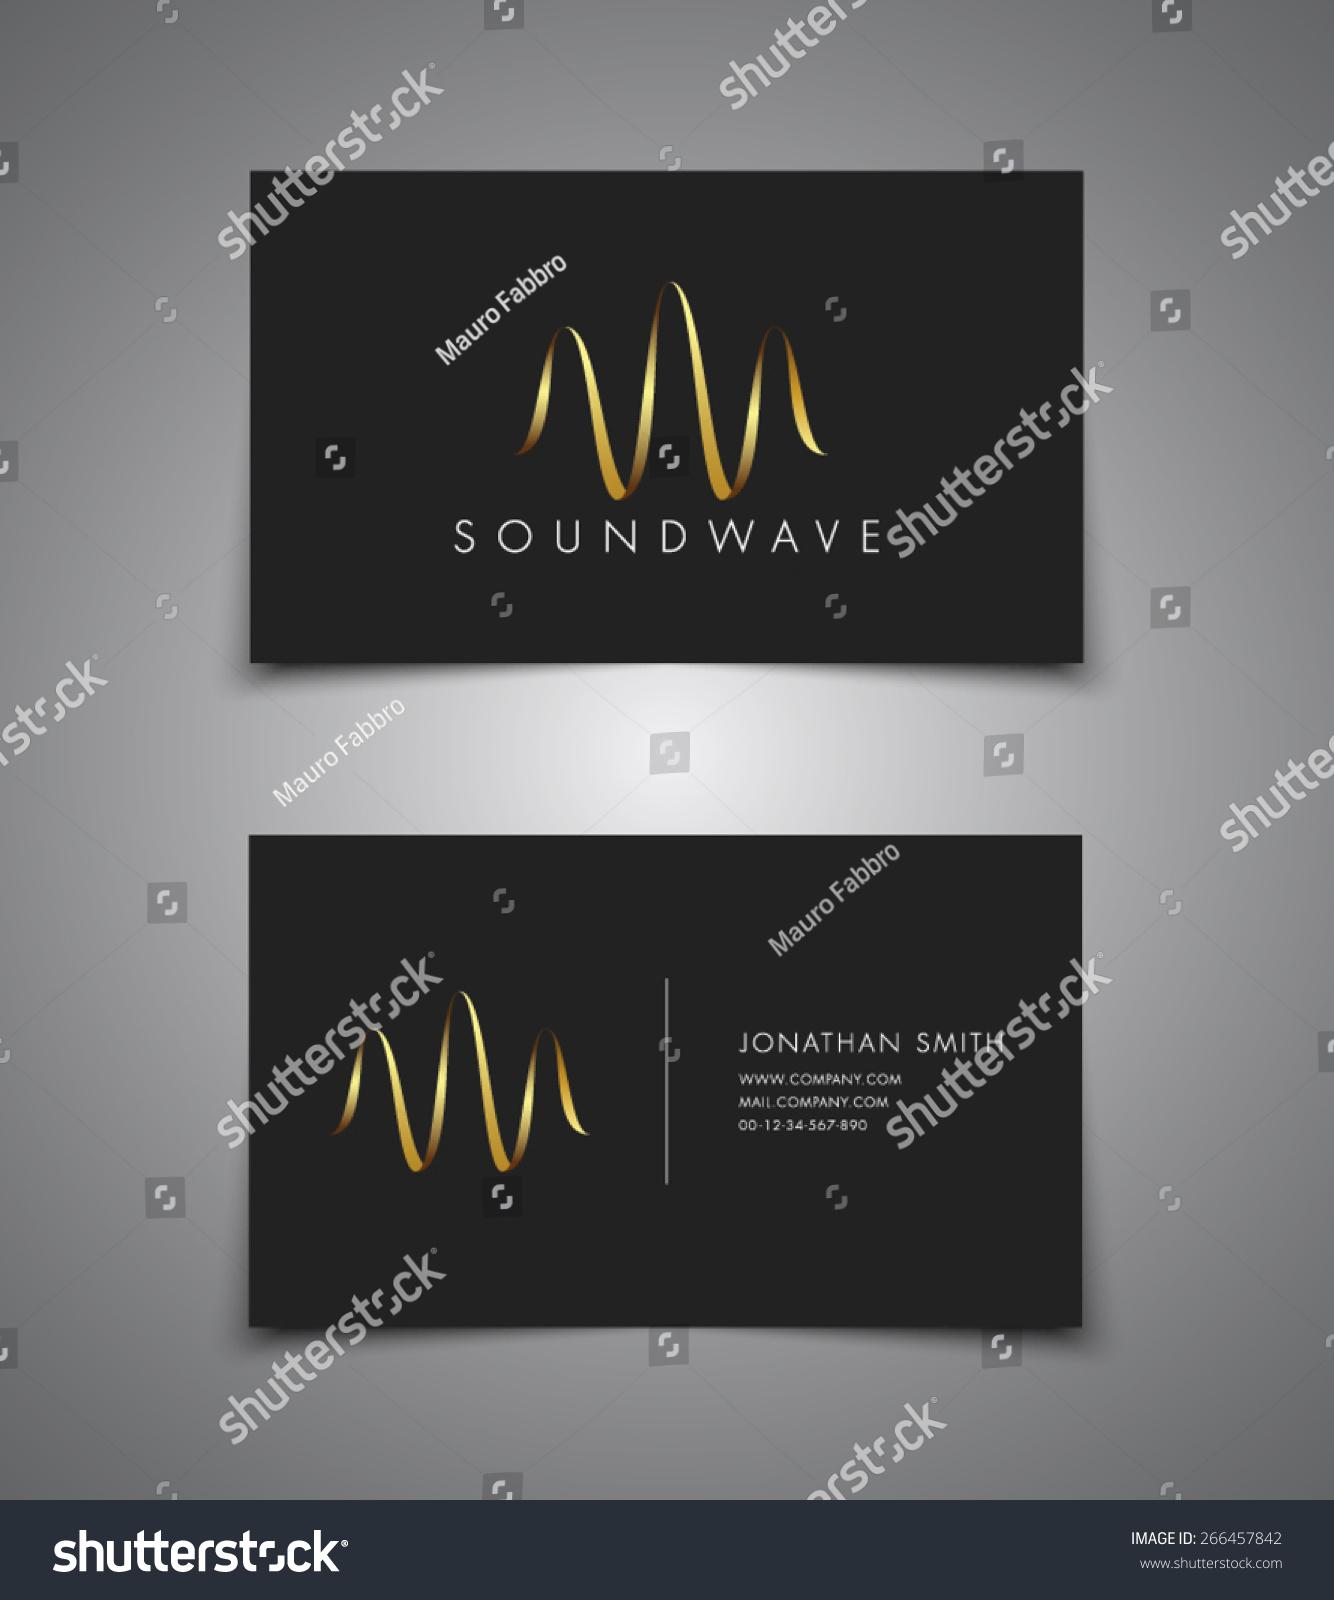 Business Card Sound Wave Music Dj Stock Vector 266457842 - Shutterstock